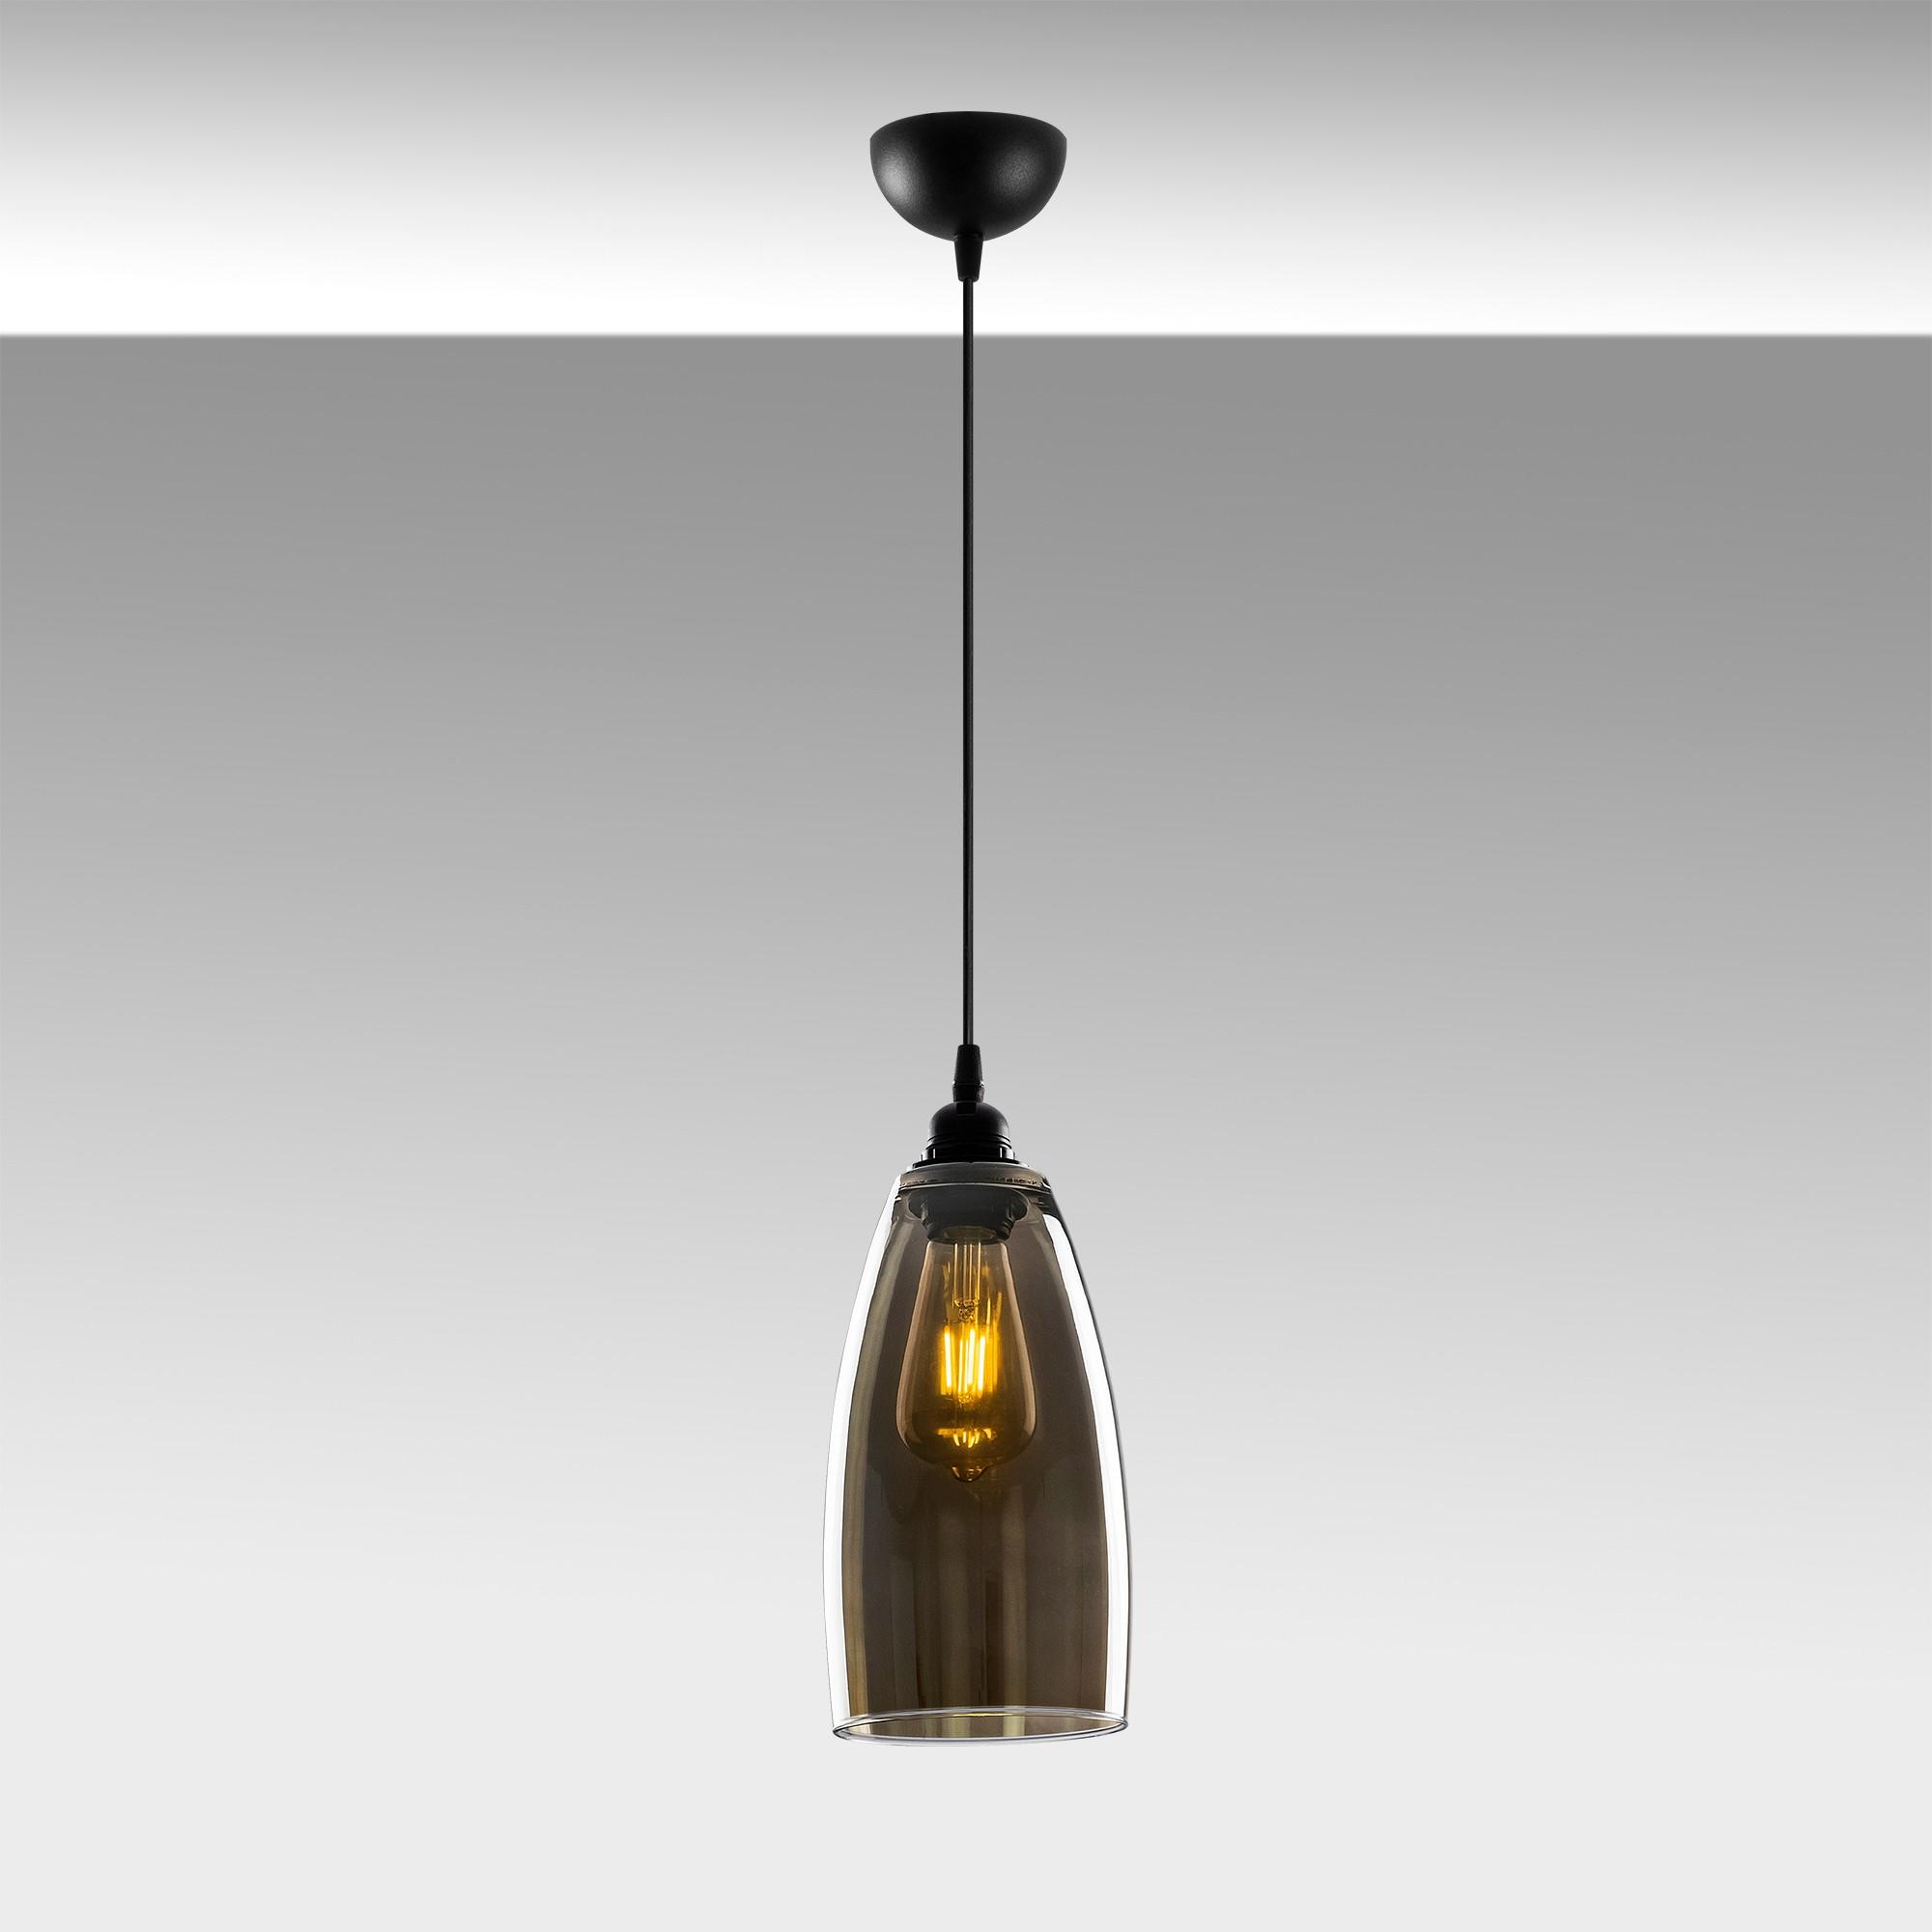 Hanglamp glad smoked glass langwerpig 1 x E27 fitting - sfeerfoto